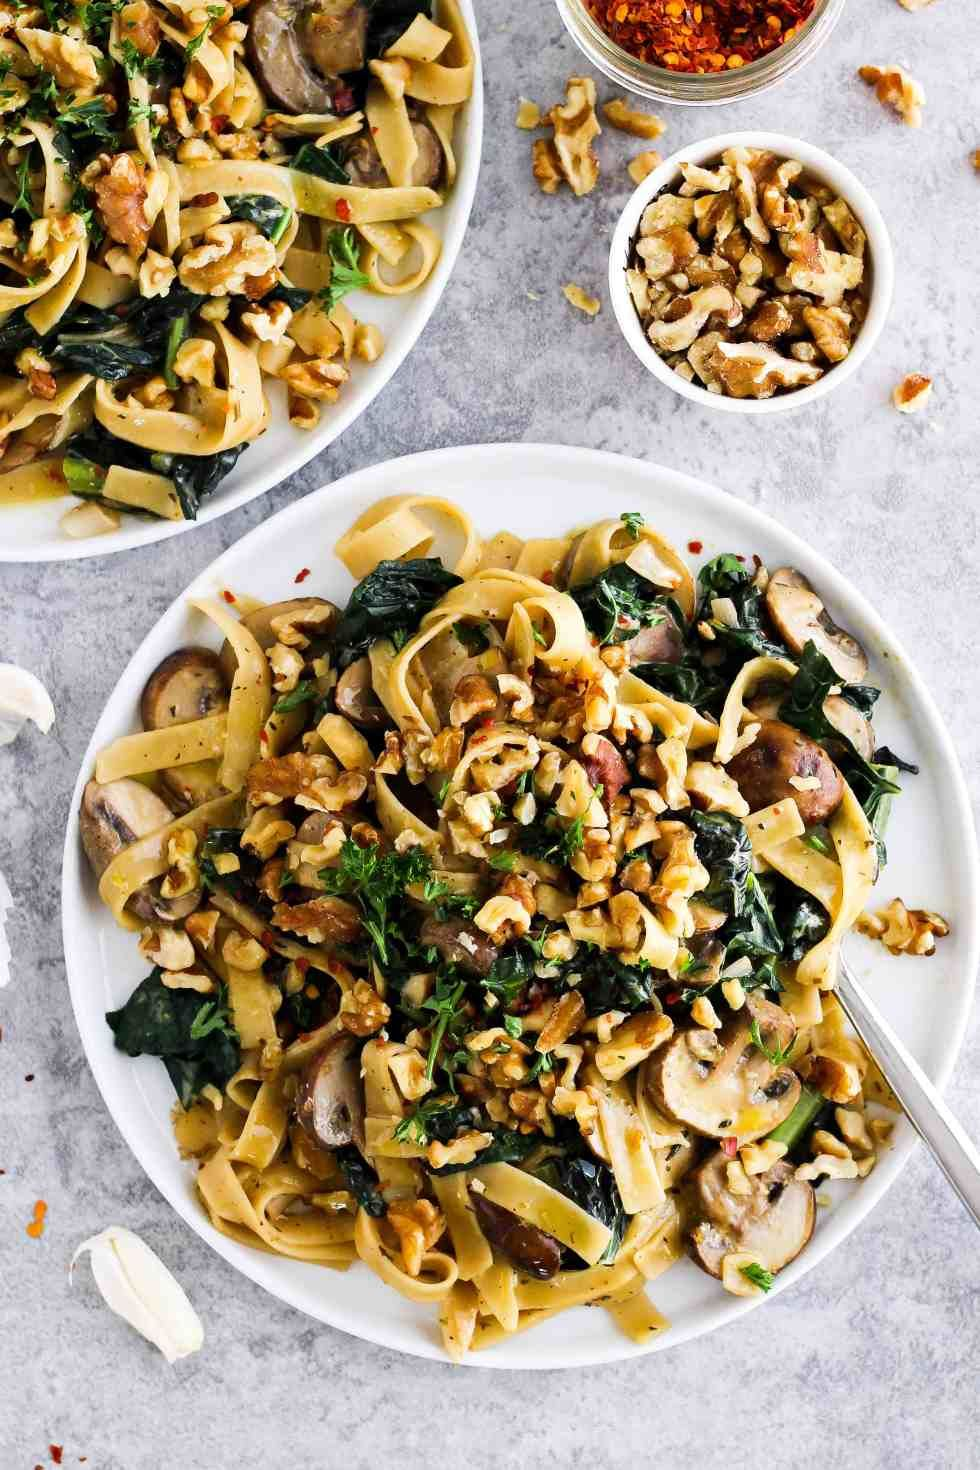 Creamy Vegan Pasta Mushroom Kale Walnut Noodles Recipe Recipe Vegan Pasta Creamy Vegan Pasta Kale Recipes Vegan